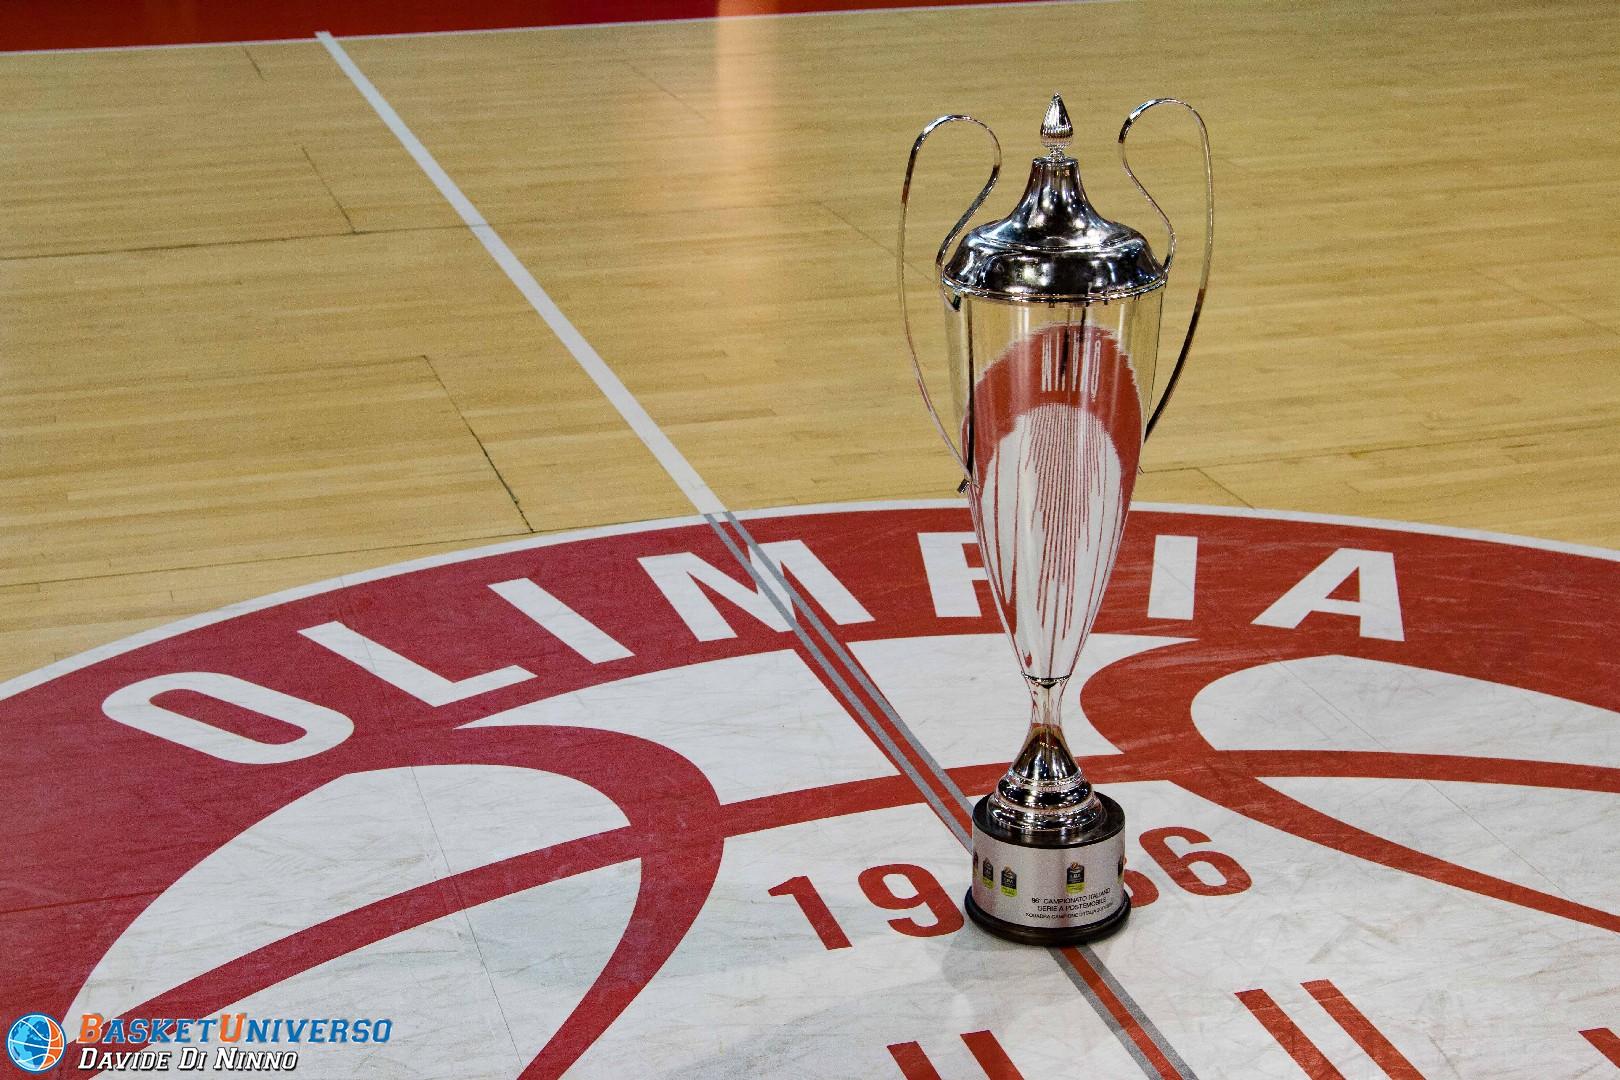 Legabasket Calendario.Legabasket Definite Le Date Si Comincia Il 7 Ottobre